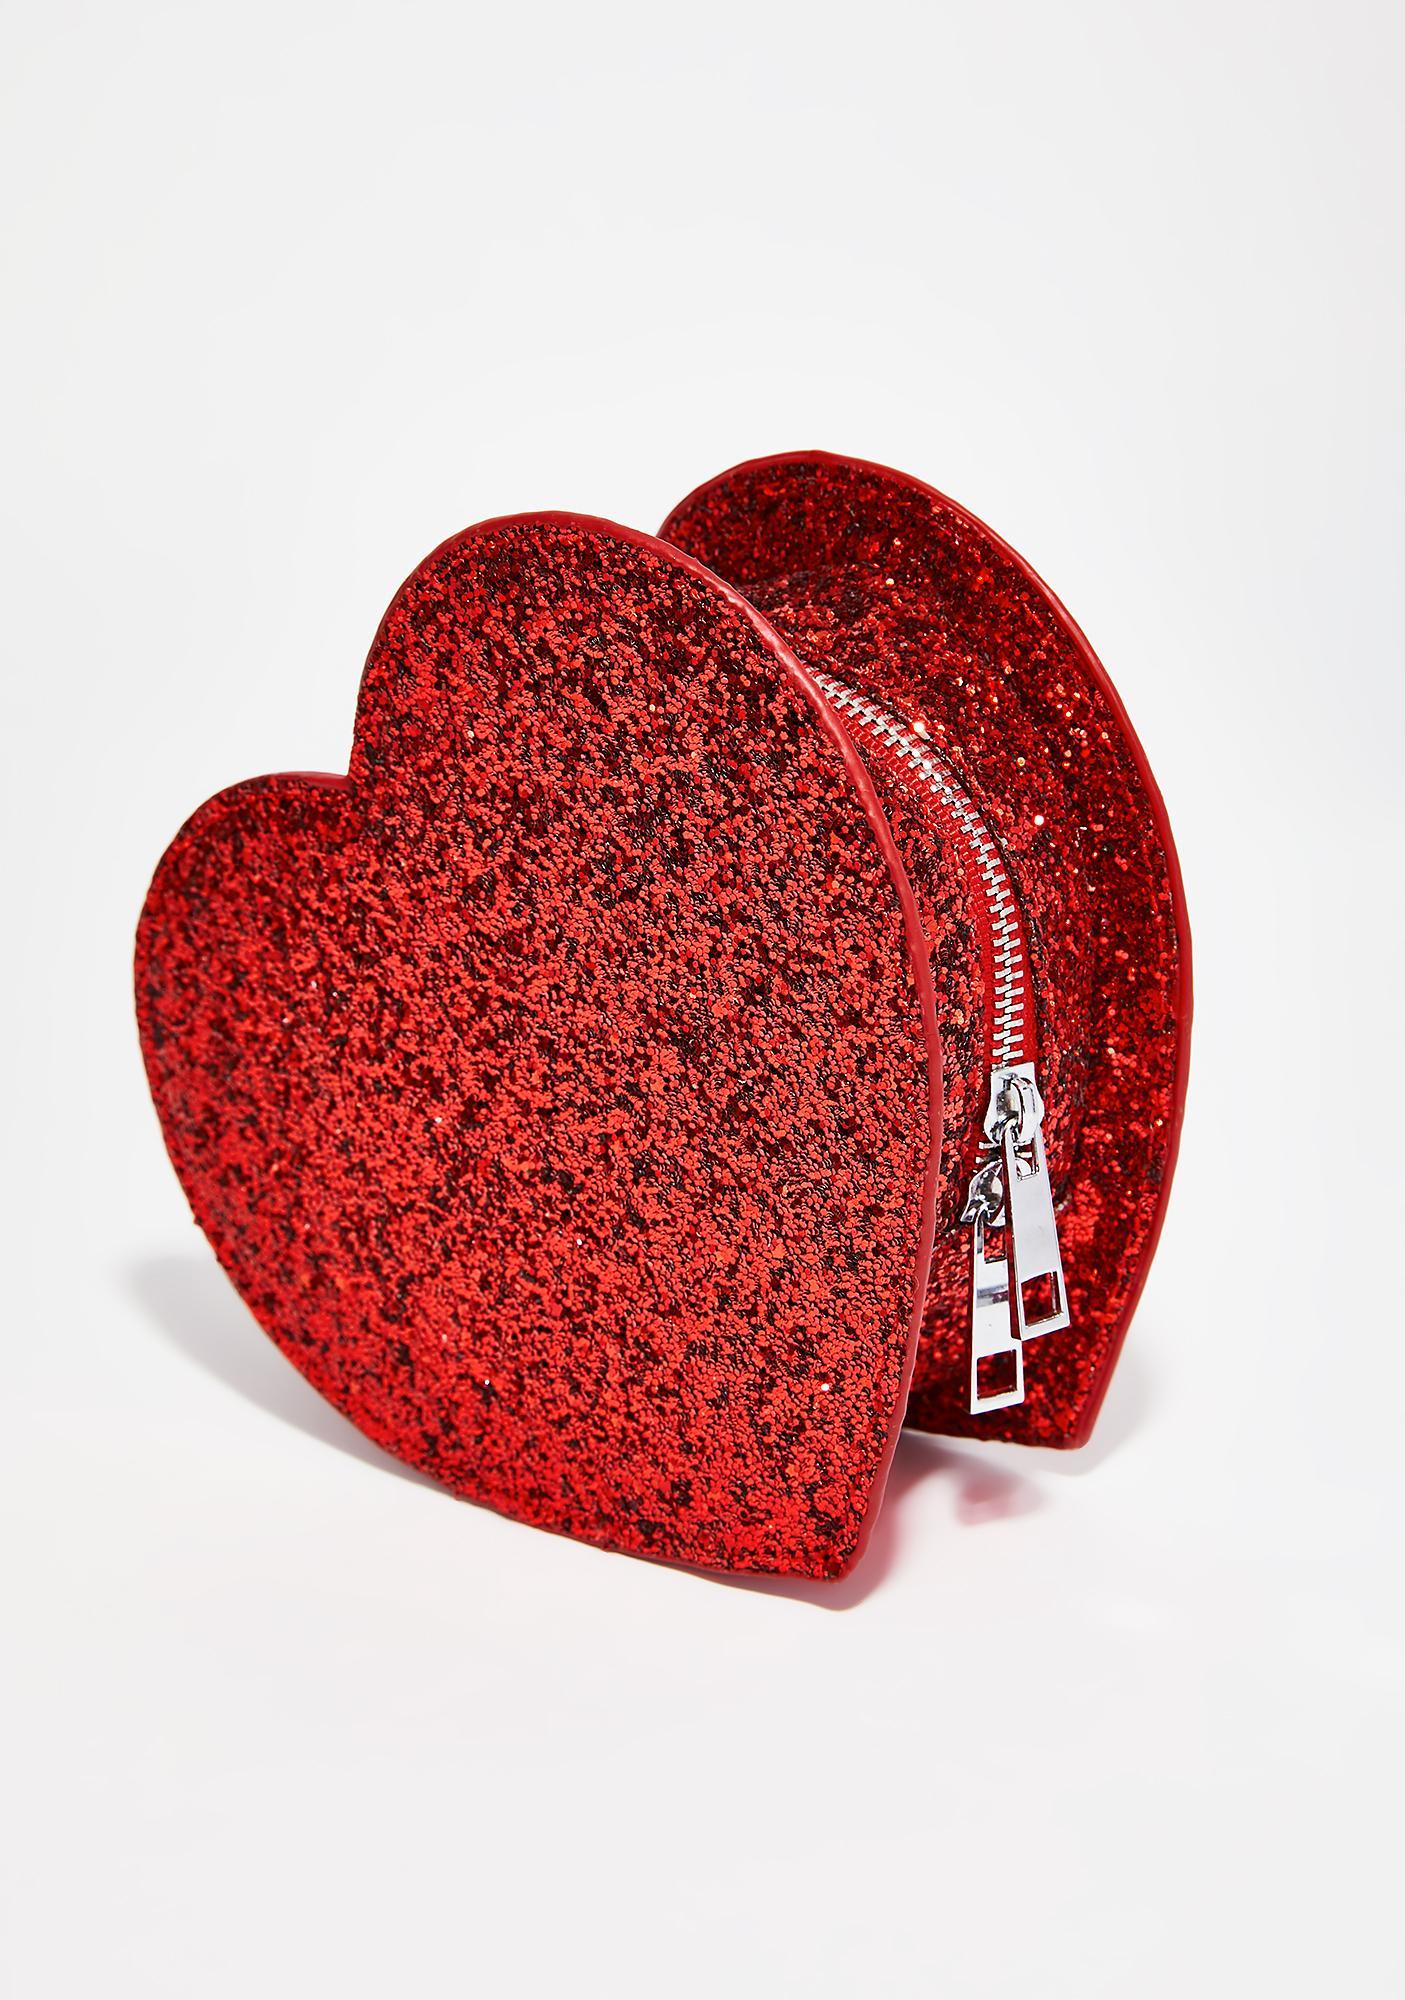 Sugar Thrillz Break Hearts Not Nails Manicure Kit